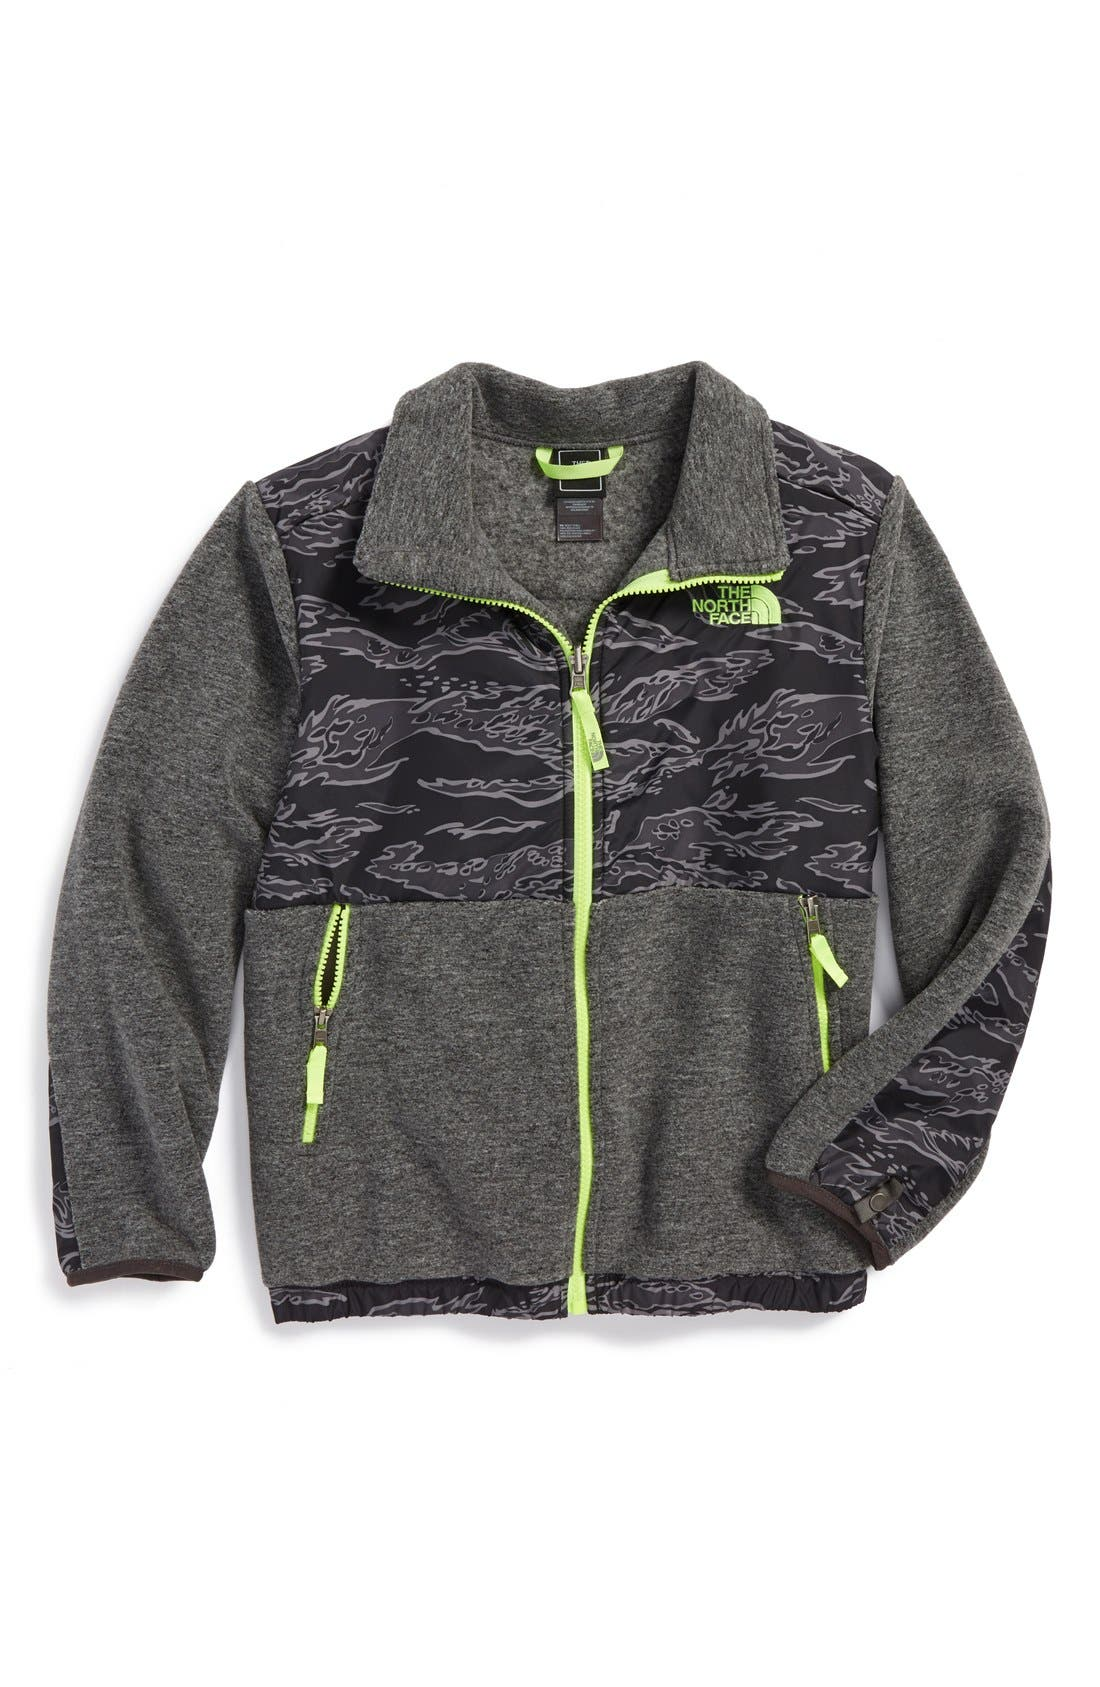 Main Image - The North Face 'Denali' Recycled Fleece Jacket (Big Boys)